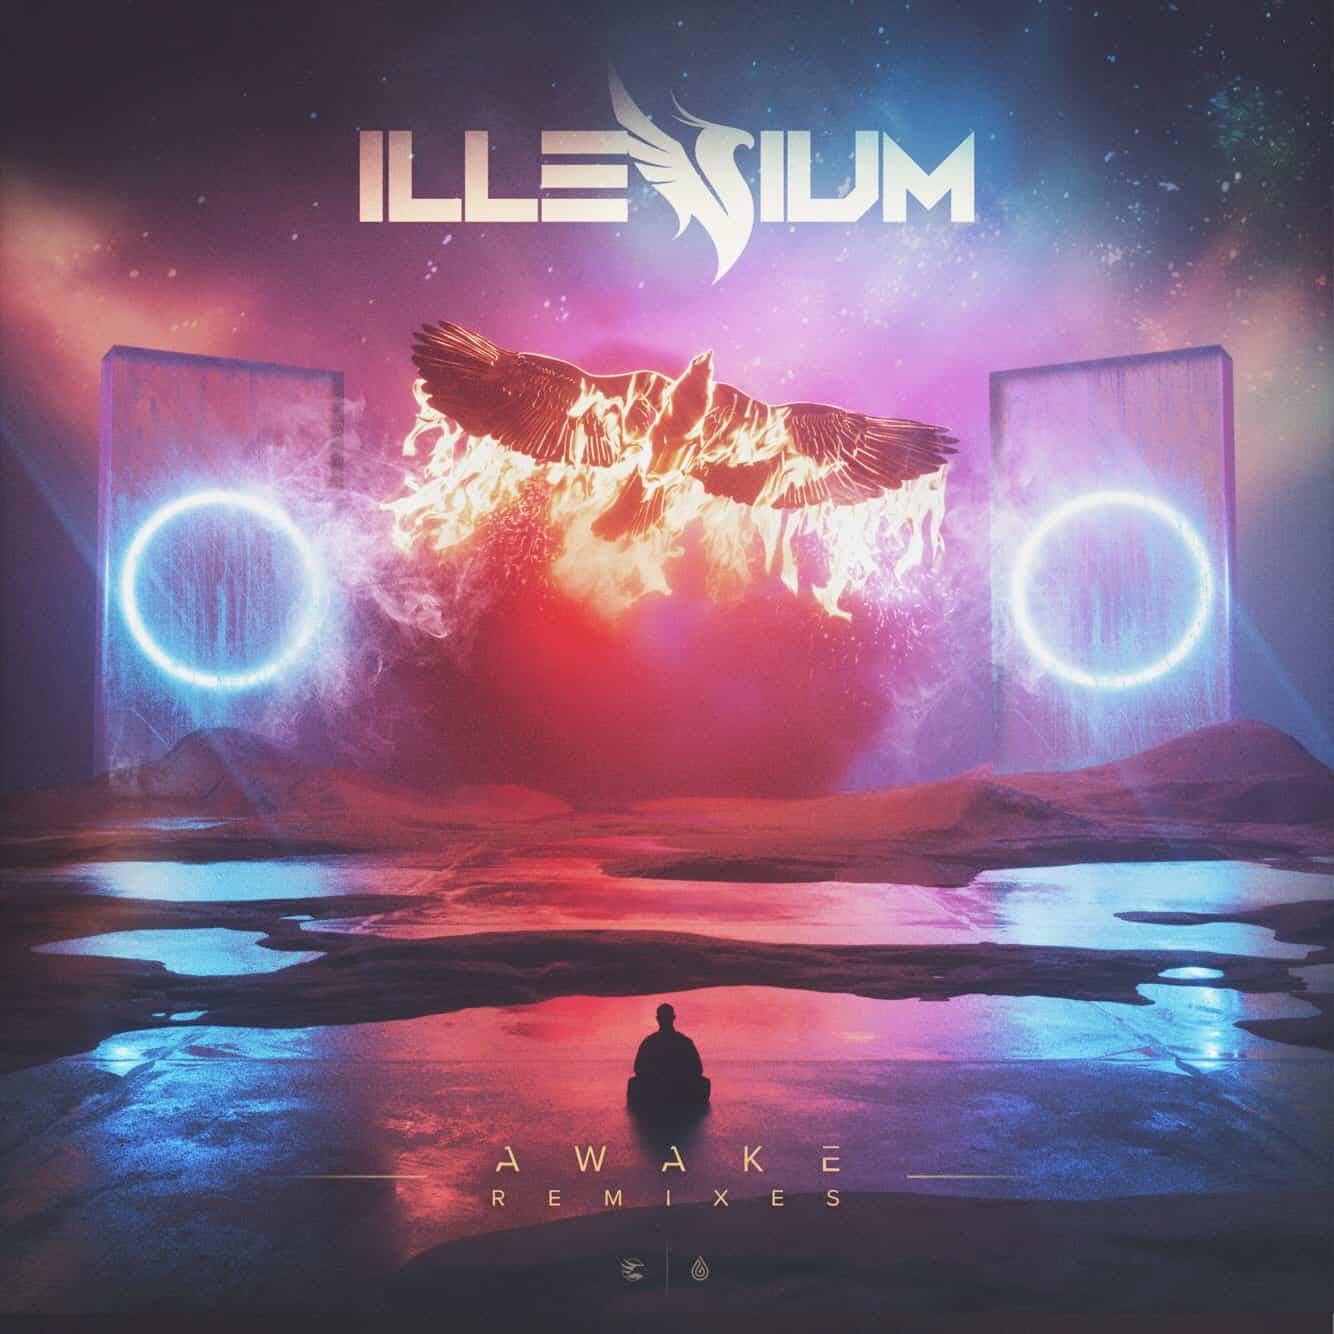 ILLENIUM Delivers Massive 15-Track Remix Package For His Sophomore Album 'Awake'